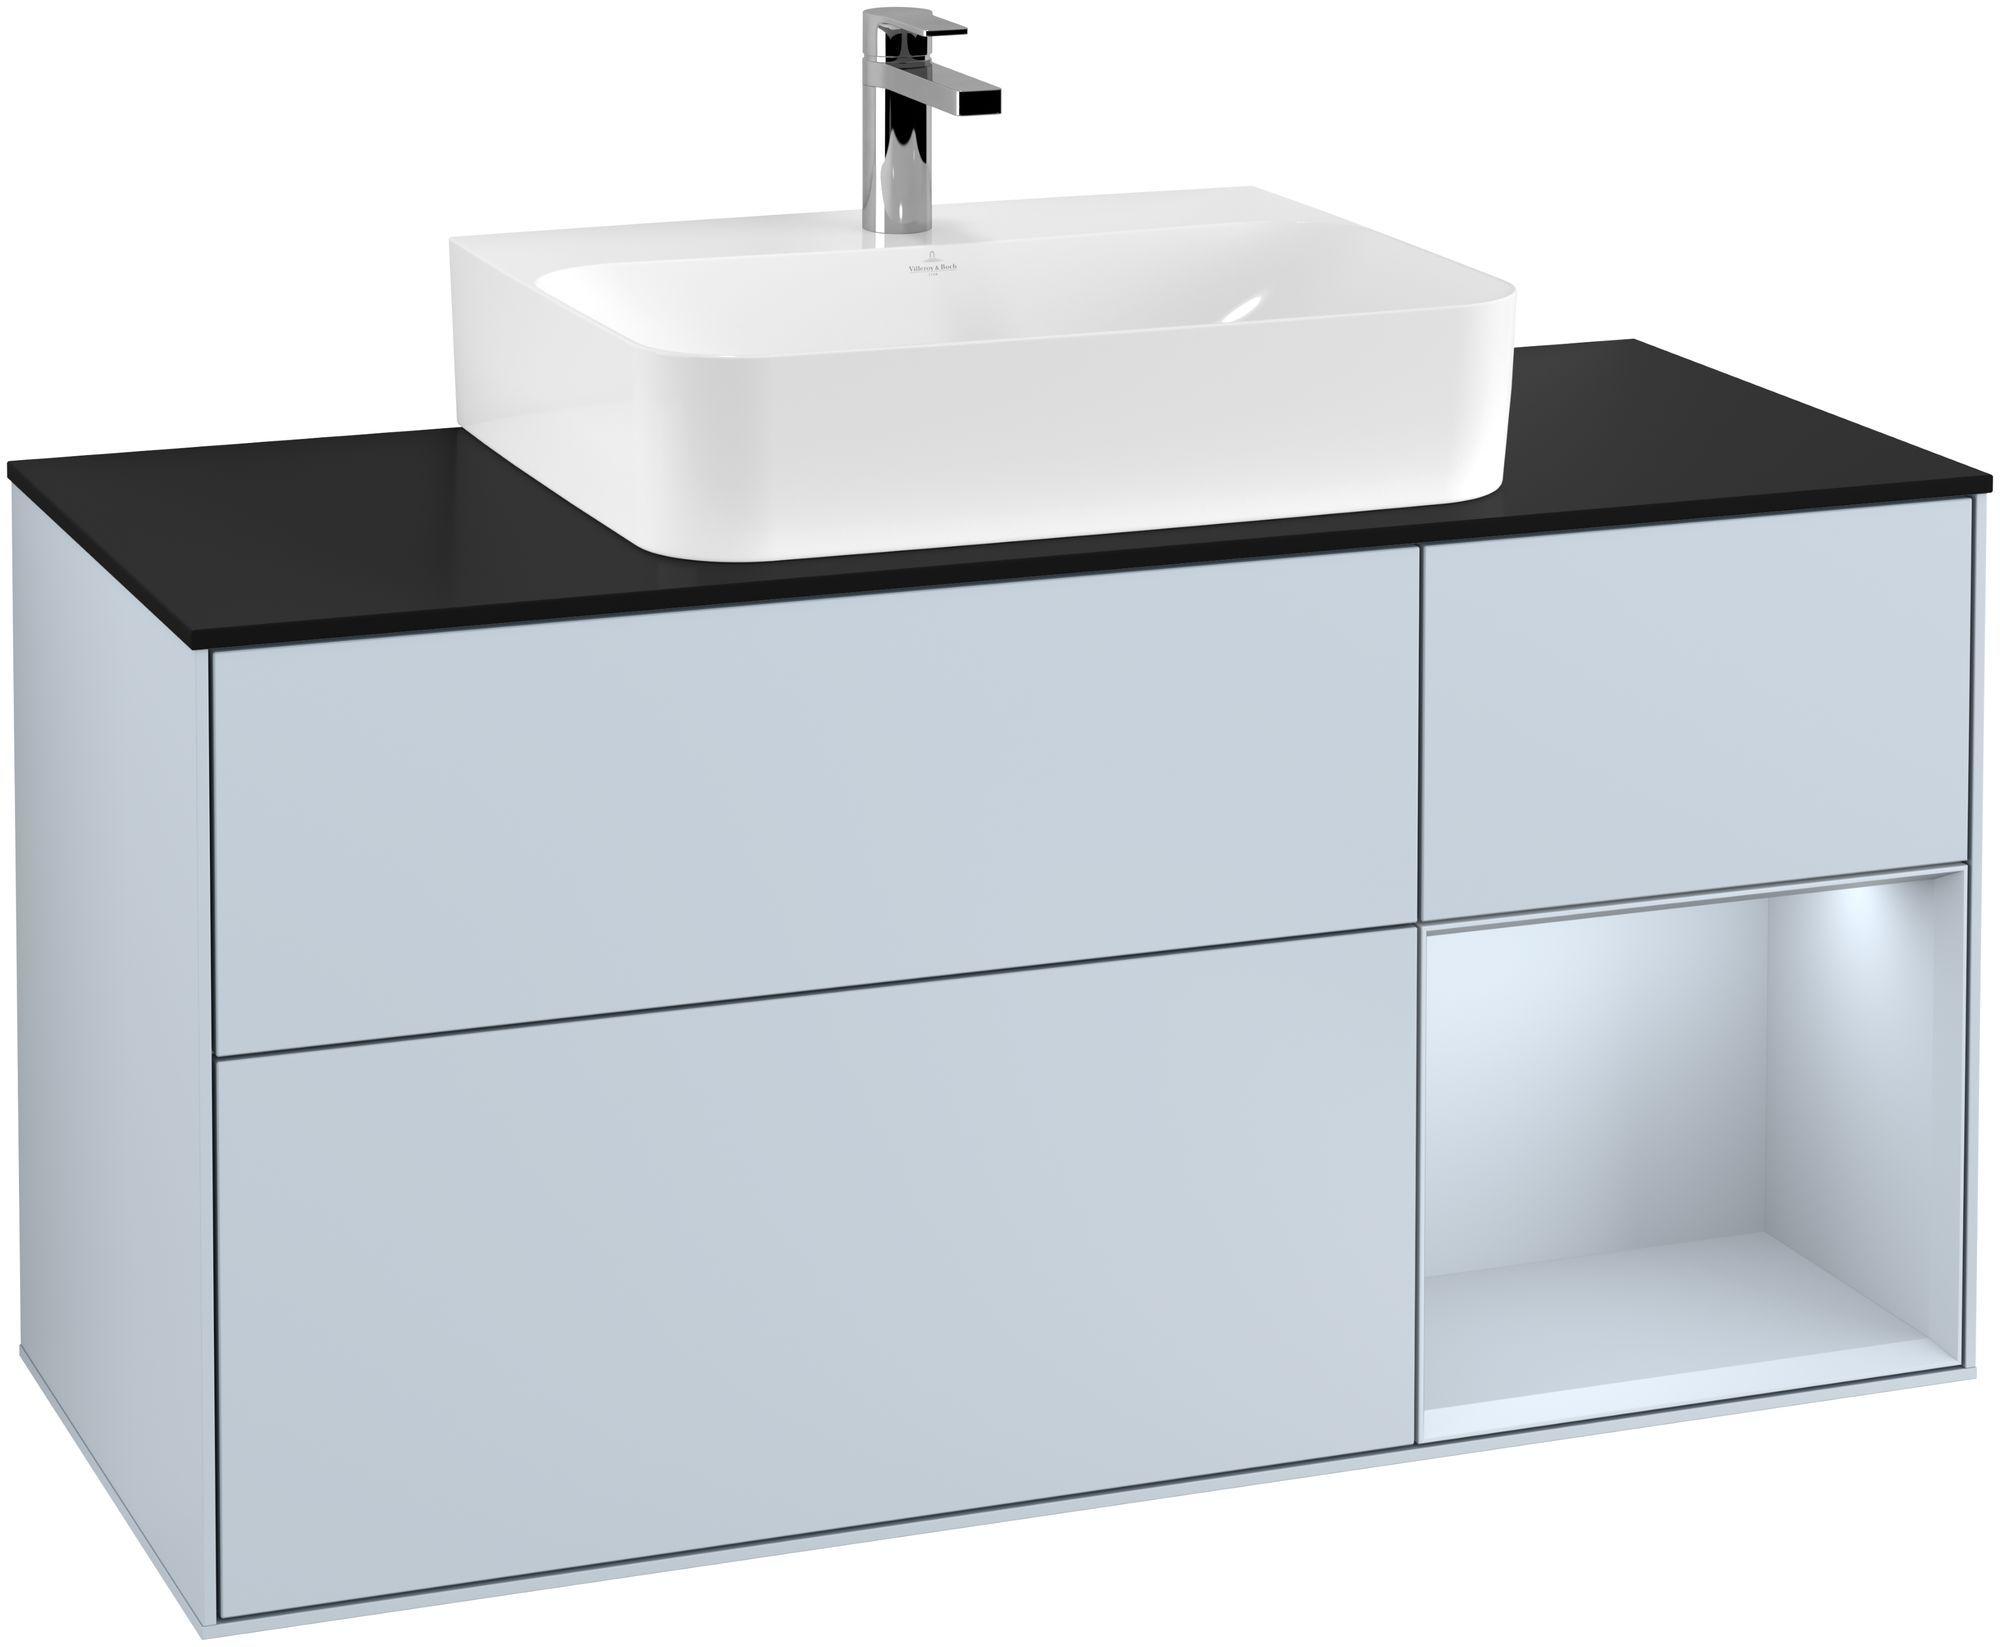 Villeroy & Boch Finion G17 Waschtischunterschrank mit Regalelement 3 Auszüge Waschtisch mittig LED-Beleuchtung B:120xH:60,3xT:50,1cm Front, Korpus: Cloud, Glasplatte: Black Matt G172HAHA